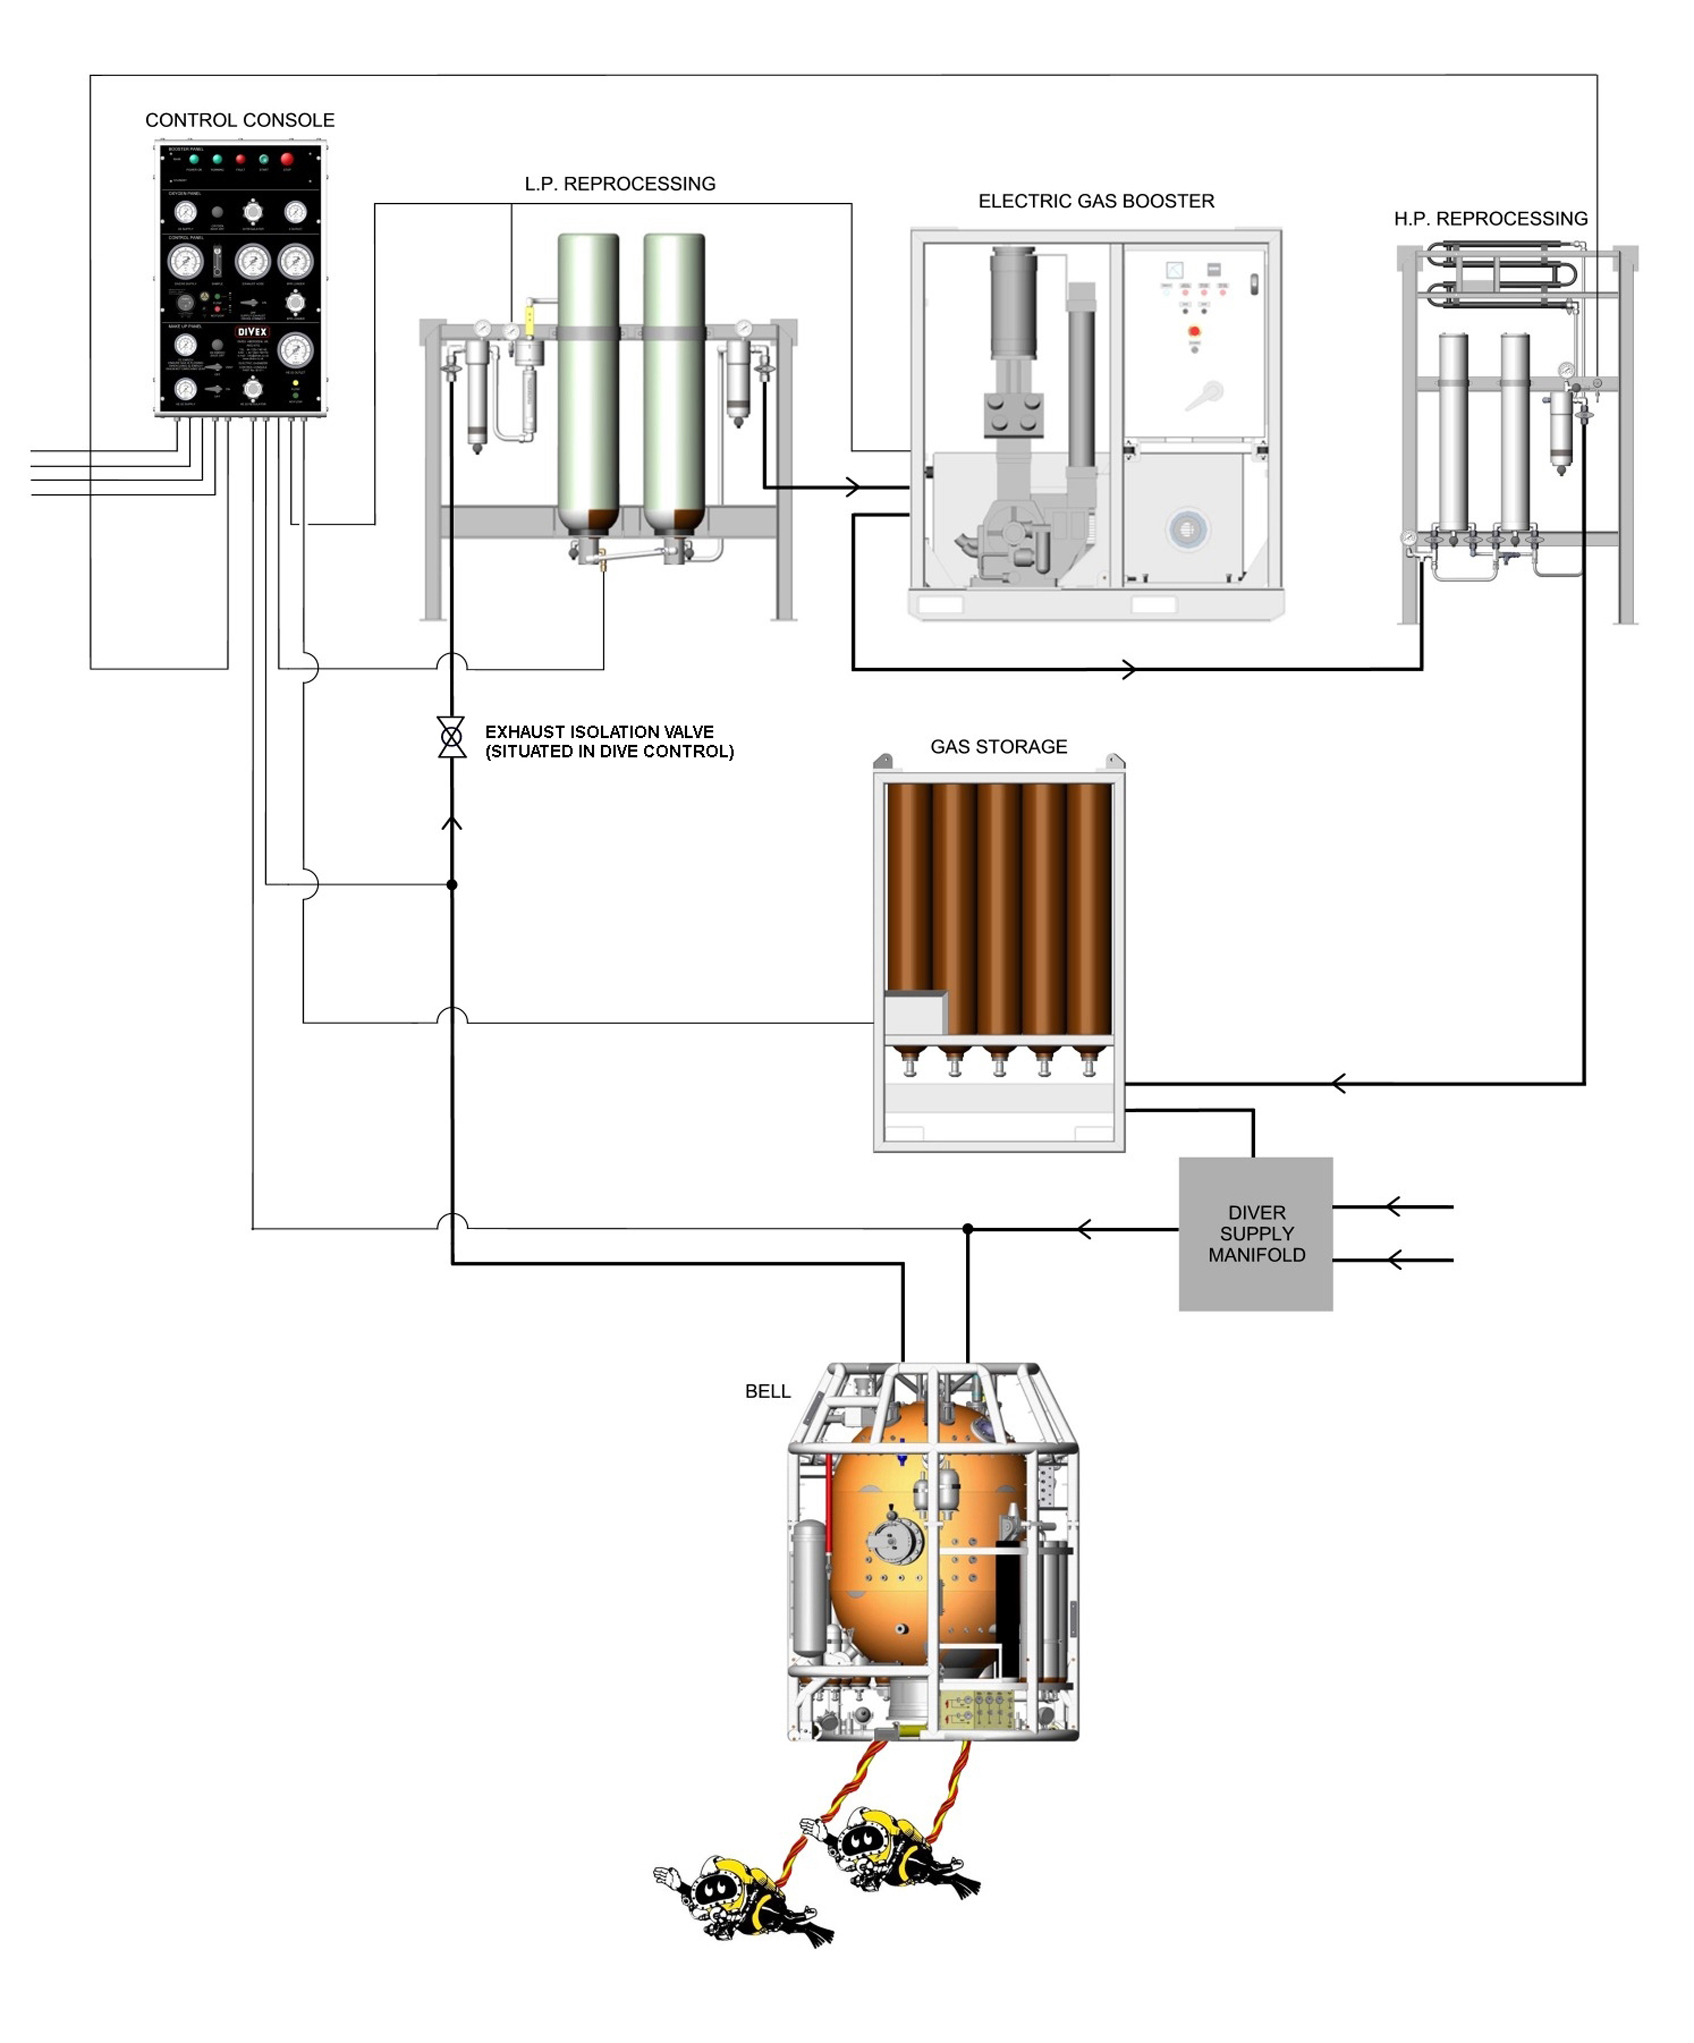 Jfd Electric Gasmizer Hyperbaric Welding Diagram Equipment Layout